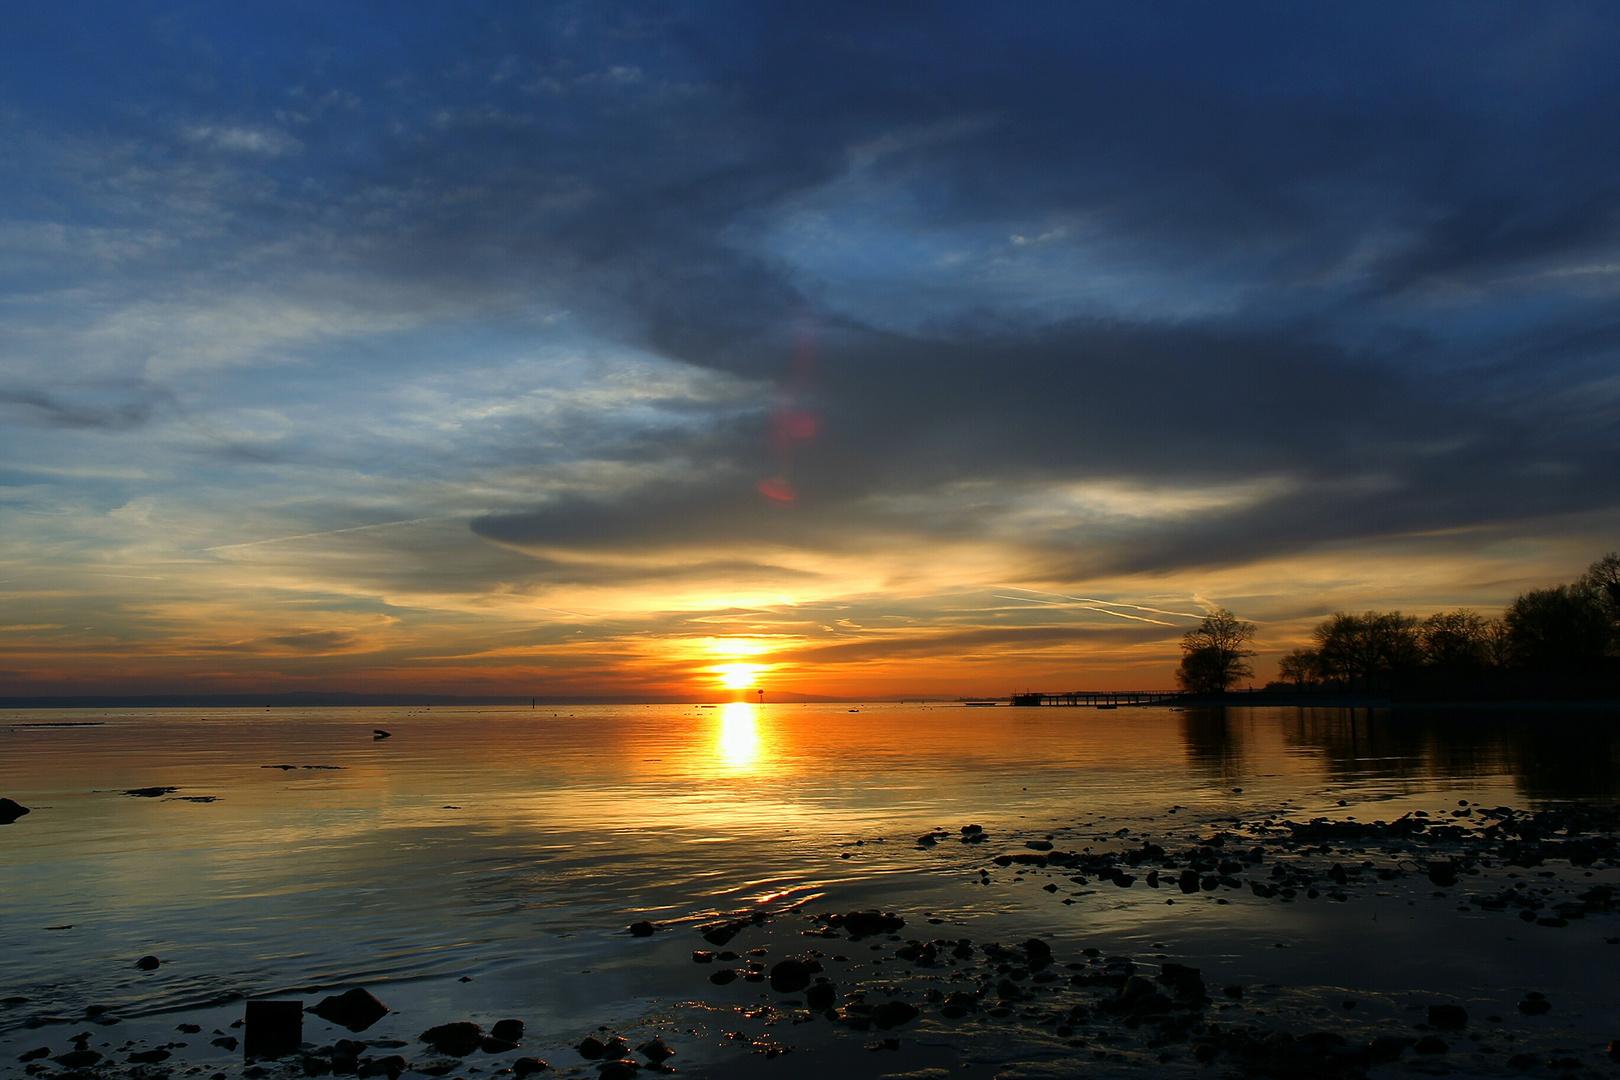 sonnenuntergang am schwabenmeer